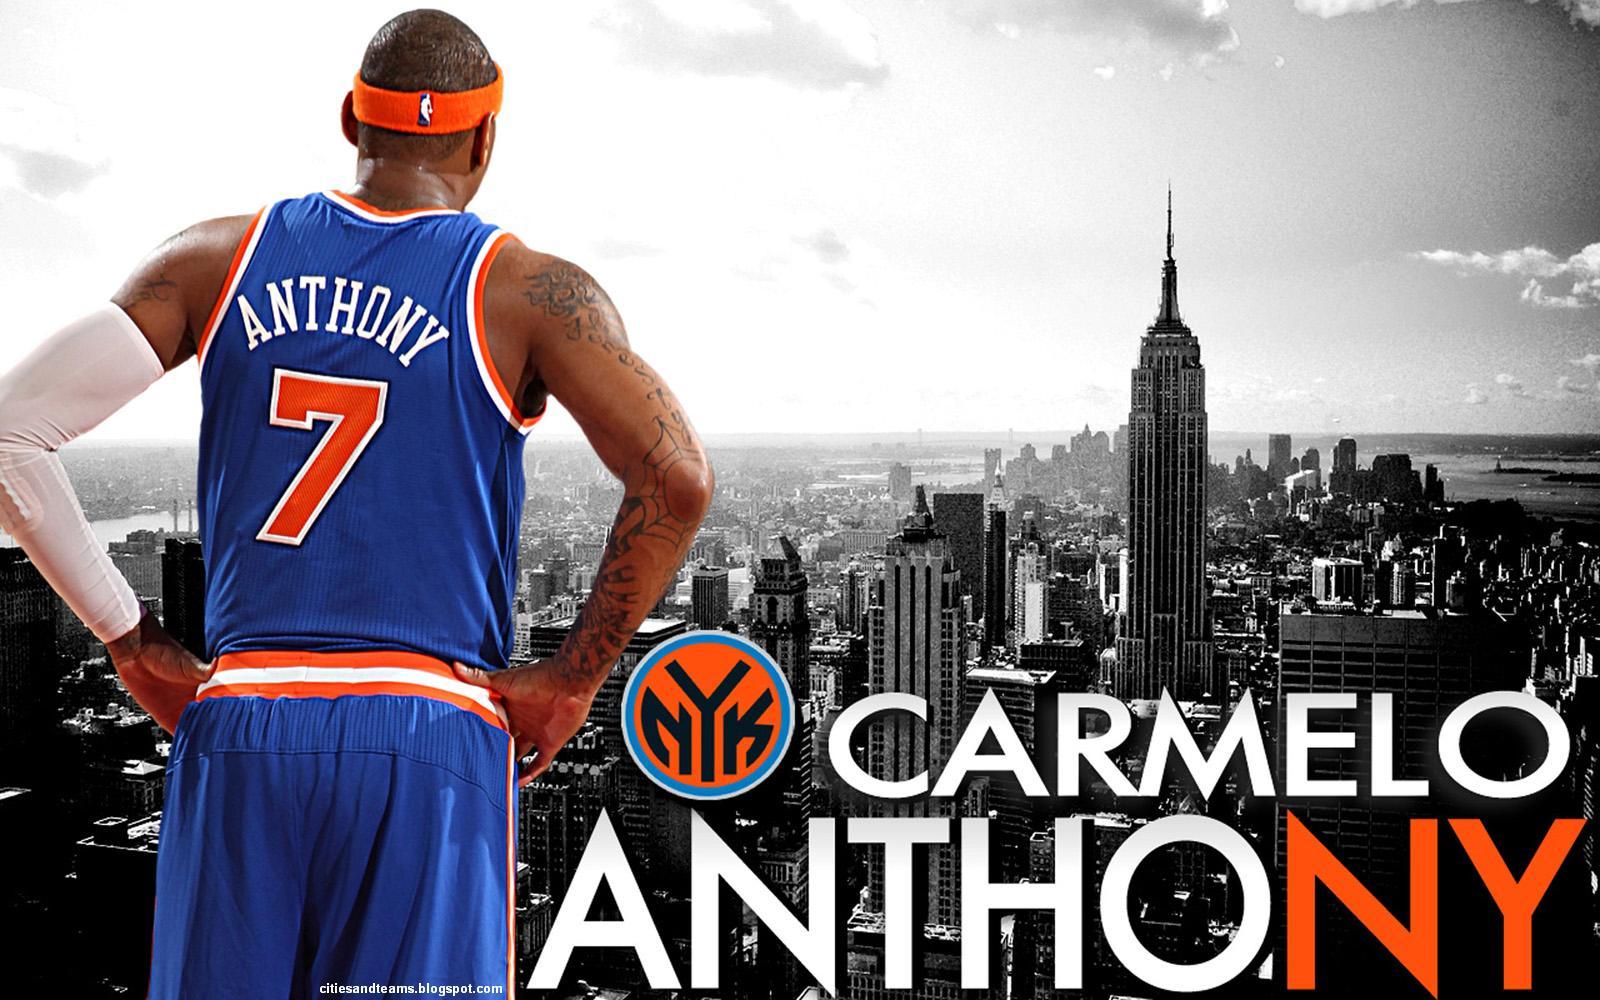 http://2.bp.blogspot.com/-G-91tCTx9jY/UMj7s5SG9gI/AAAAAAAAIto/i-NverjF-AE/s1600/Carmelo_Anthony_New_York_Knicks_American_Small_Forward_NBA_Star_USA_Hd_Desktop_Wallpaper_citiesandteams.blogspot.com.jpg